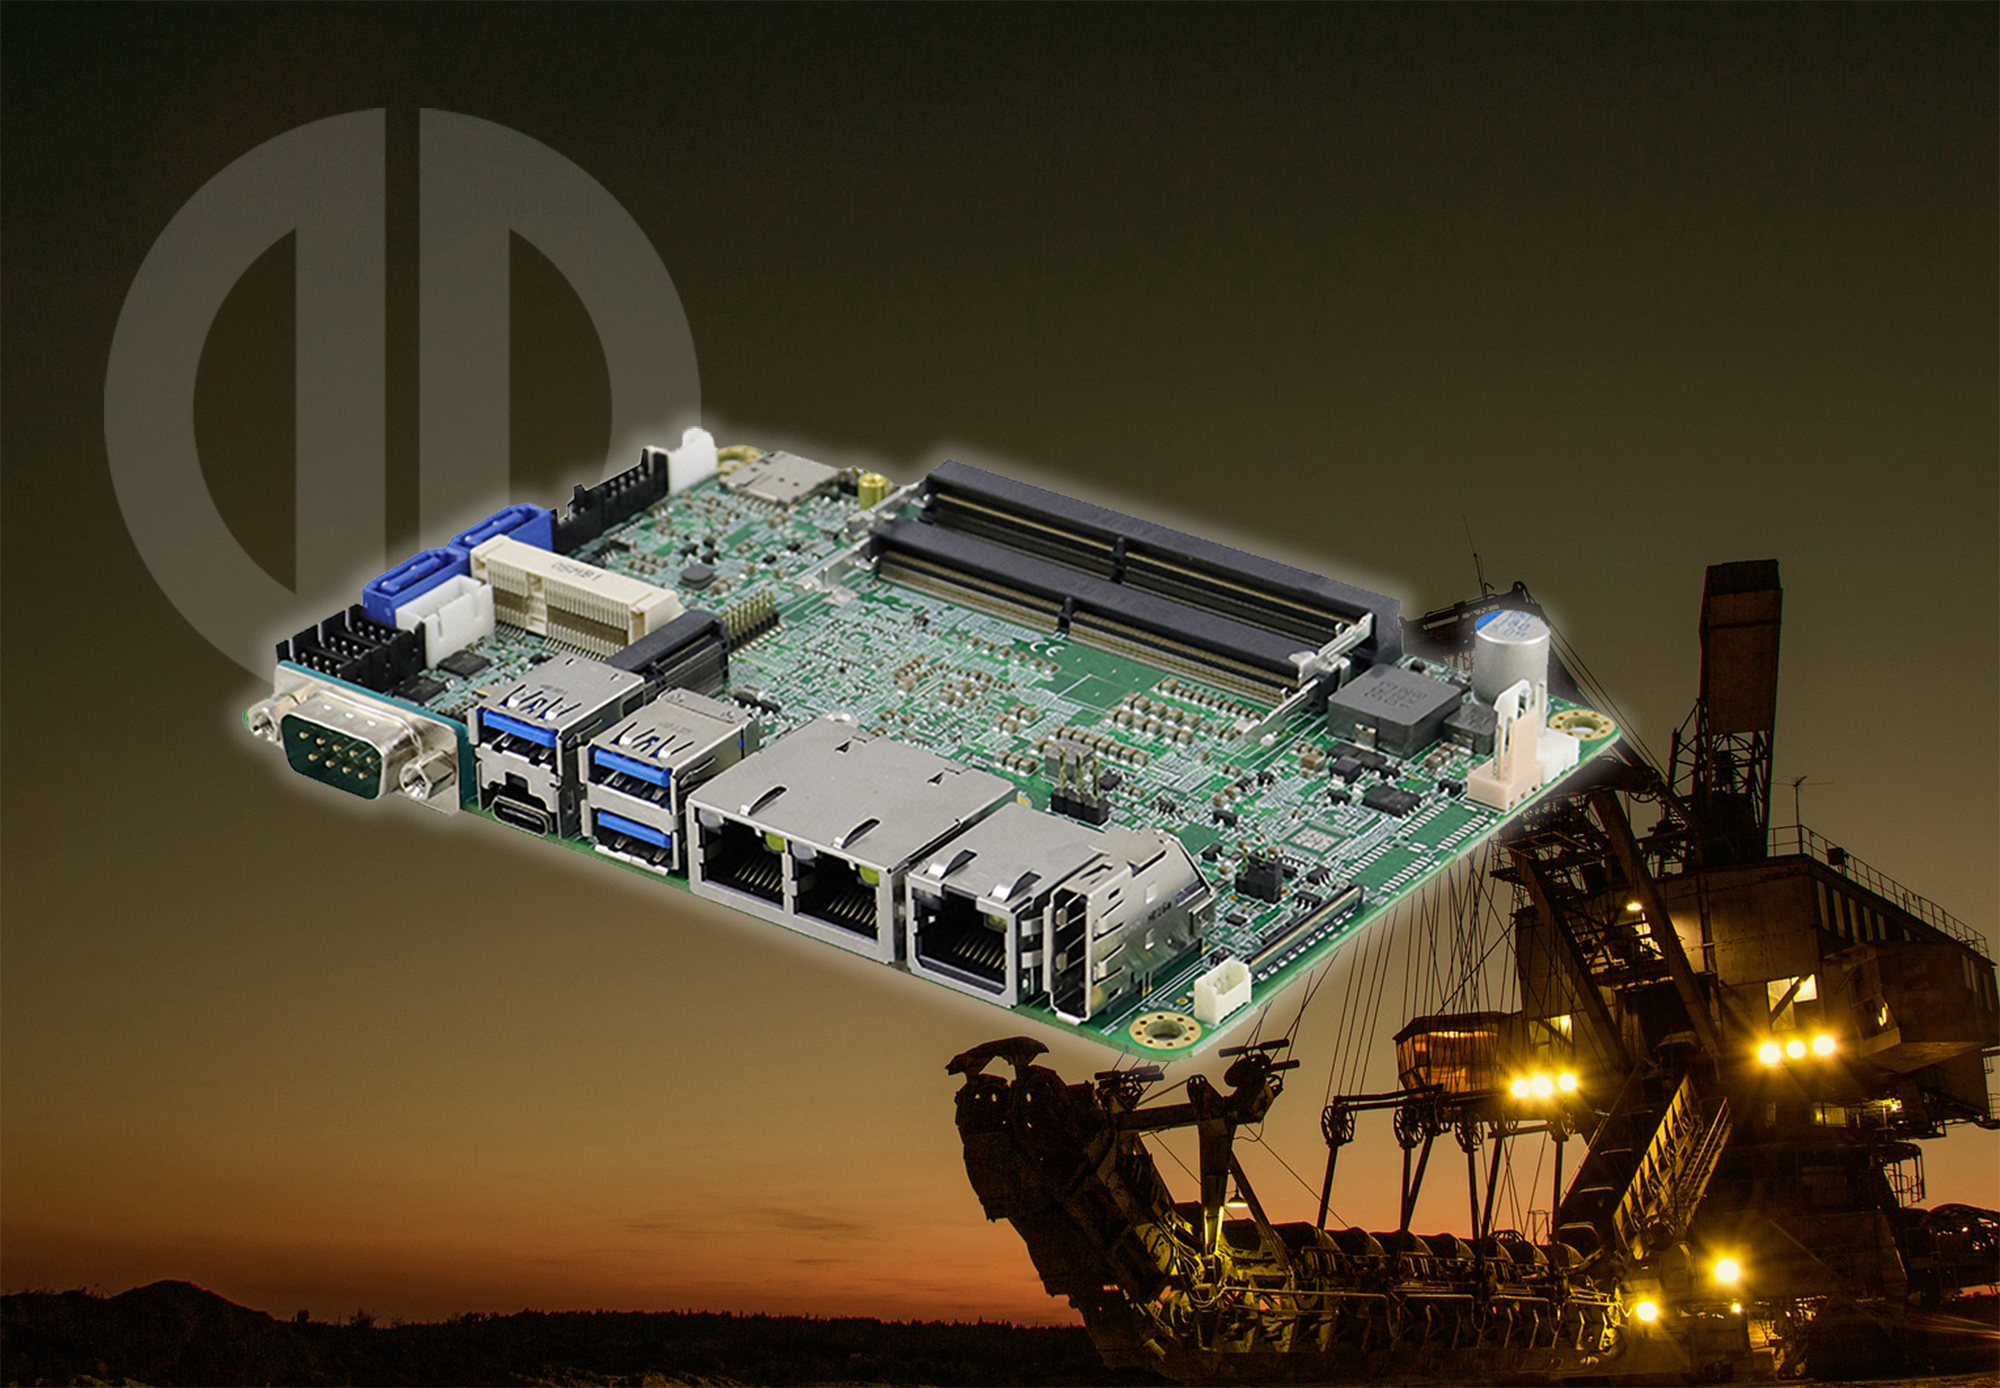 Distec nimmt Single-Board-Computer von iBase ins Sortiment